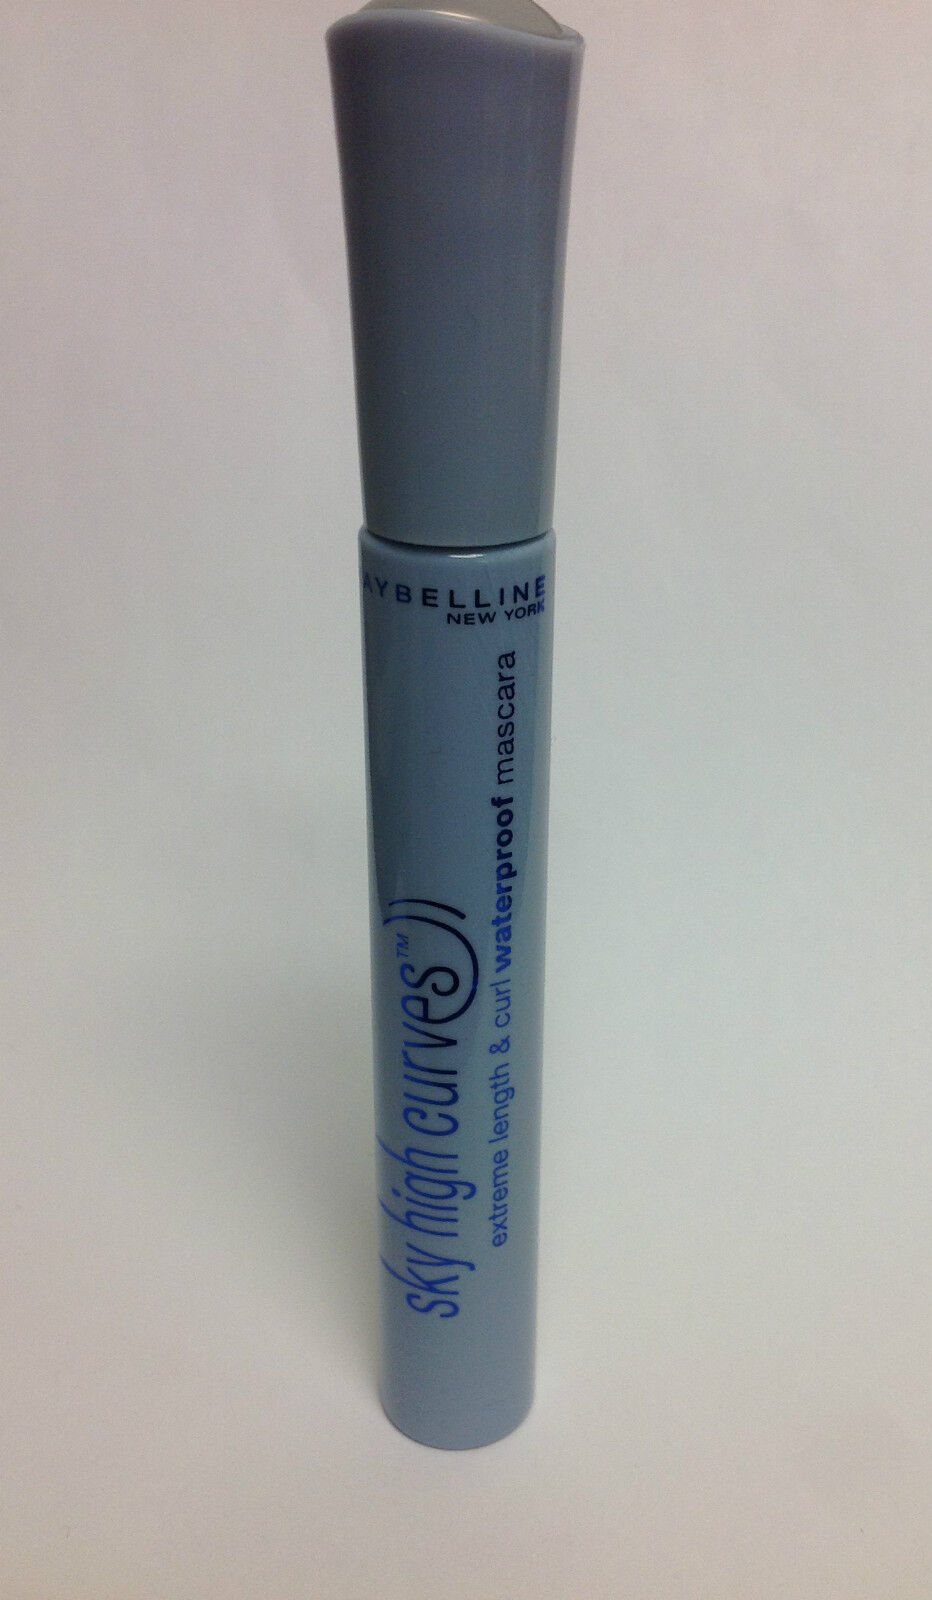 610b0df0514 Maybelline Sky High Curves Waterproof Mascara for sale online | eBay